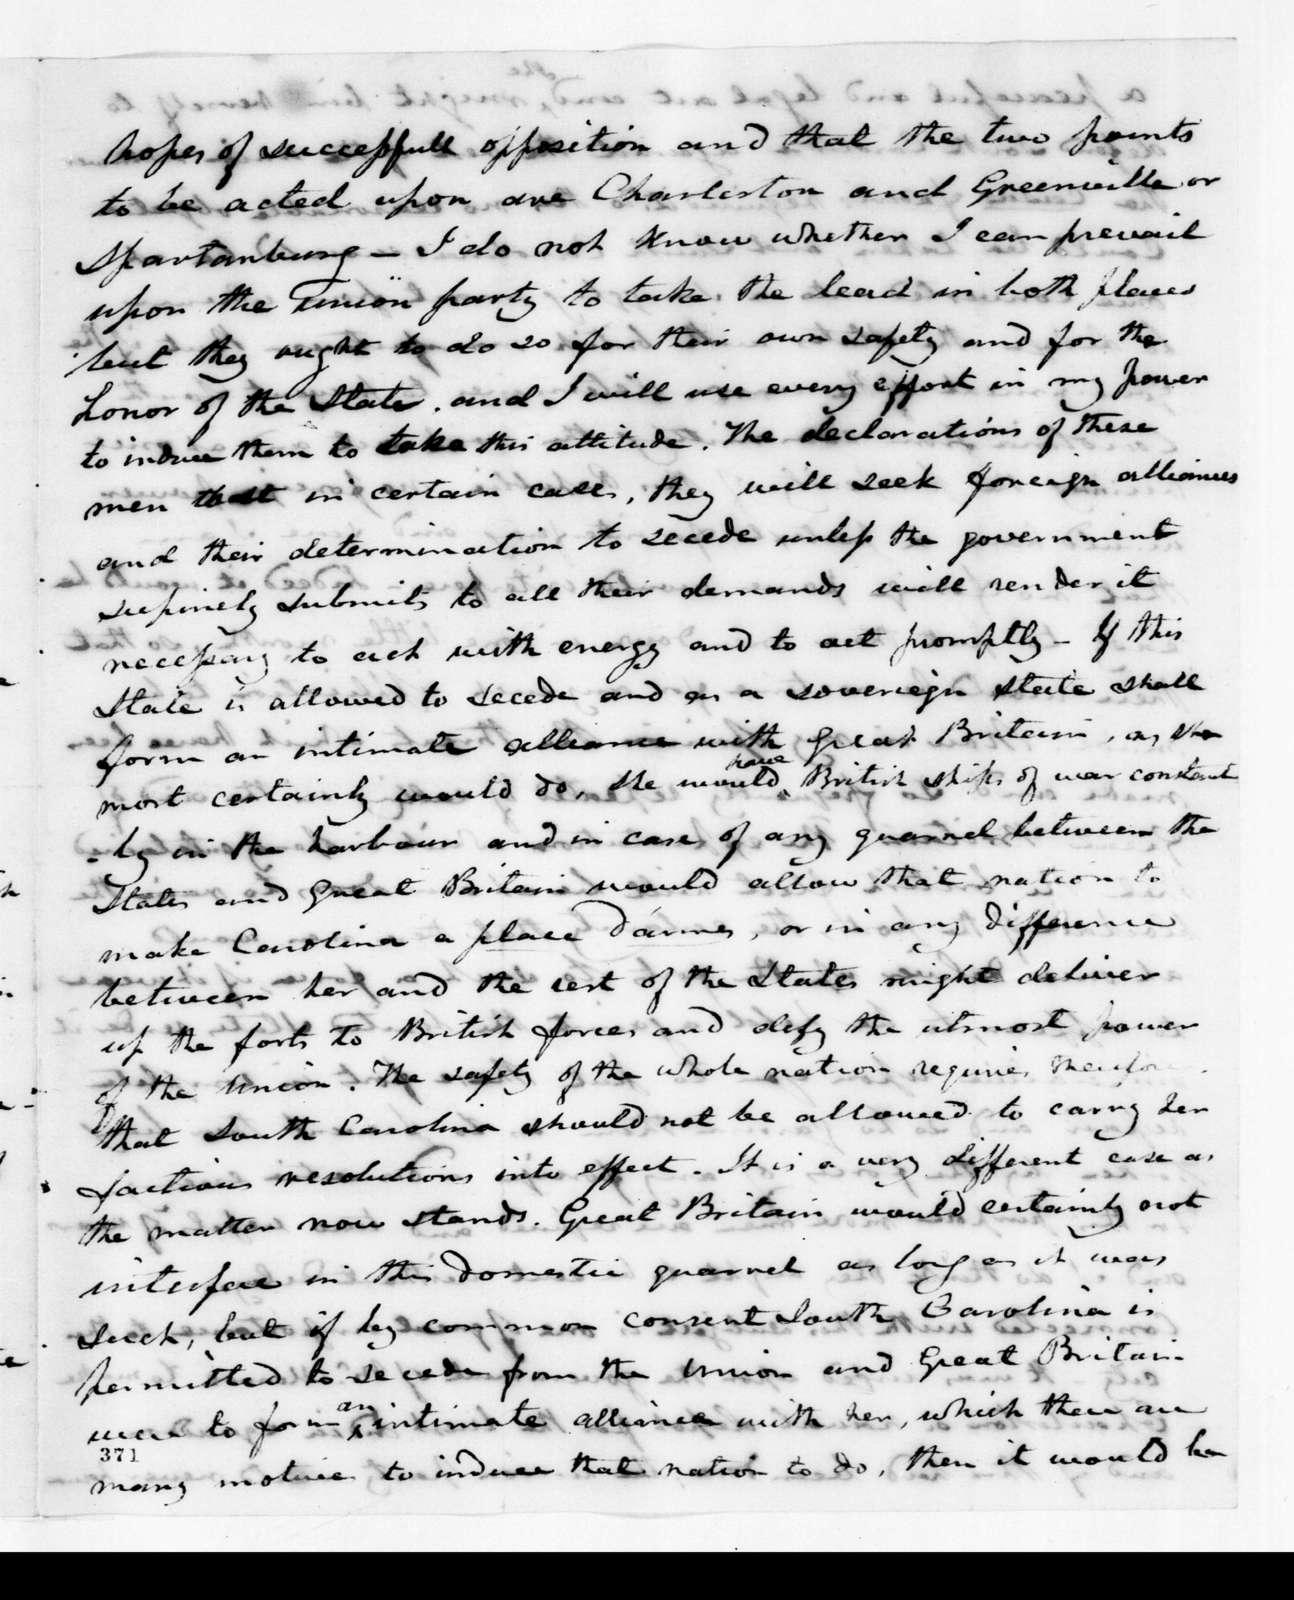 Joel Roberts Poinsett to Andrew Jackson, November 25, 1832